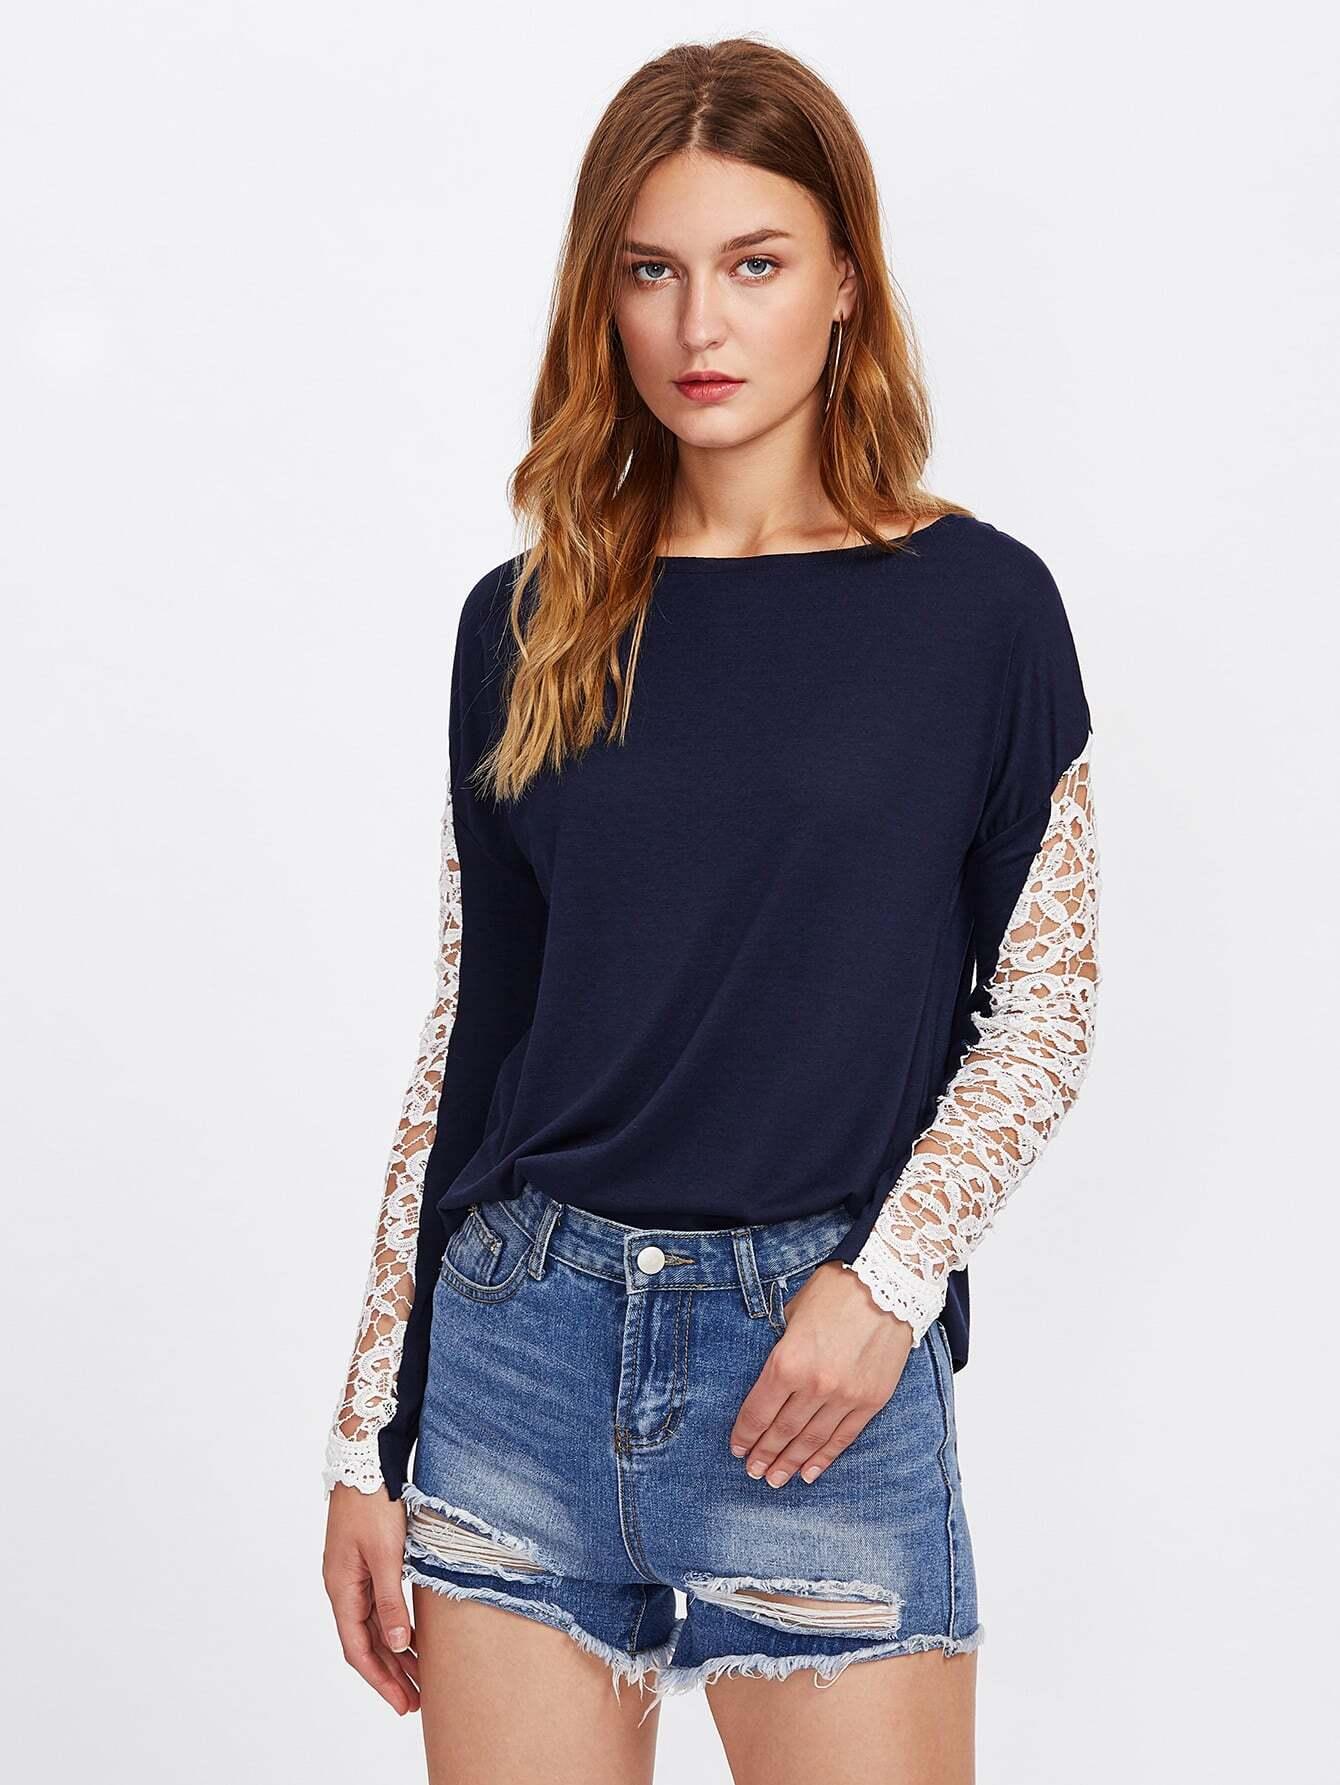 Hollow Out Crochet Insert Drop Shoulder Tee two tone drop shoulder sweatshirt